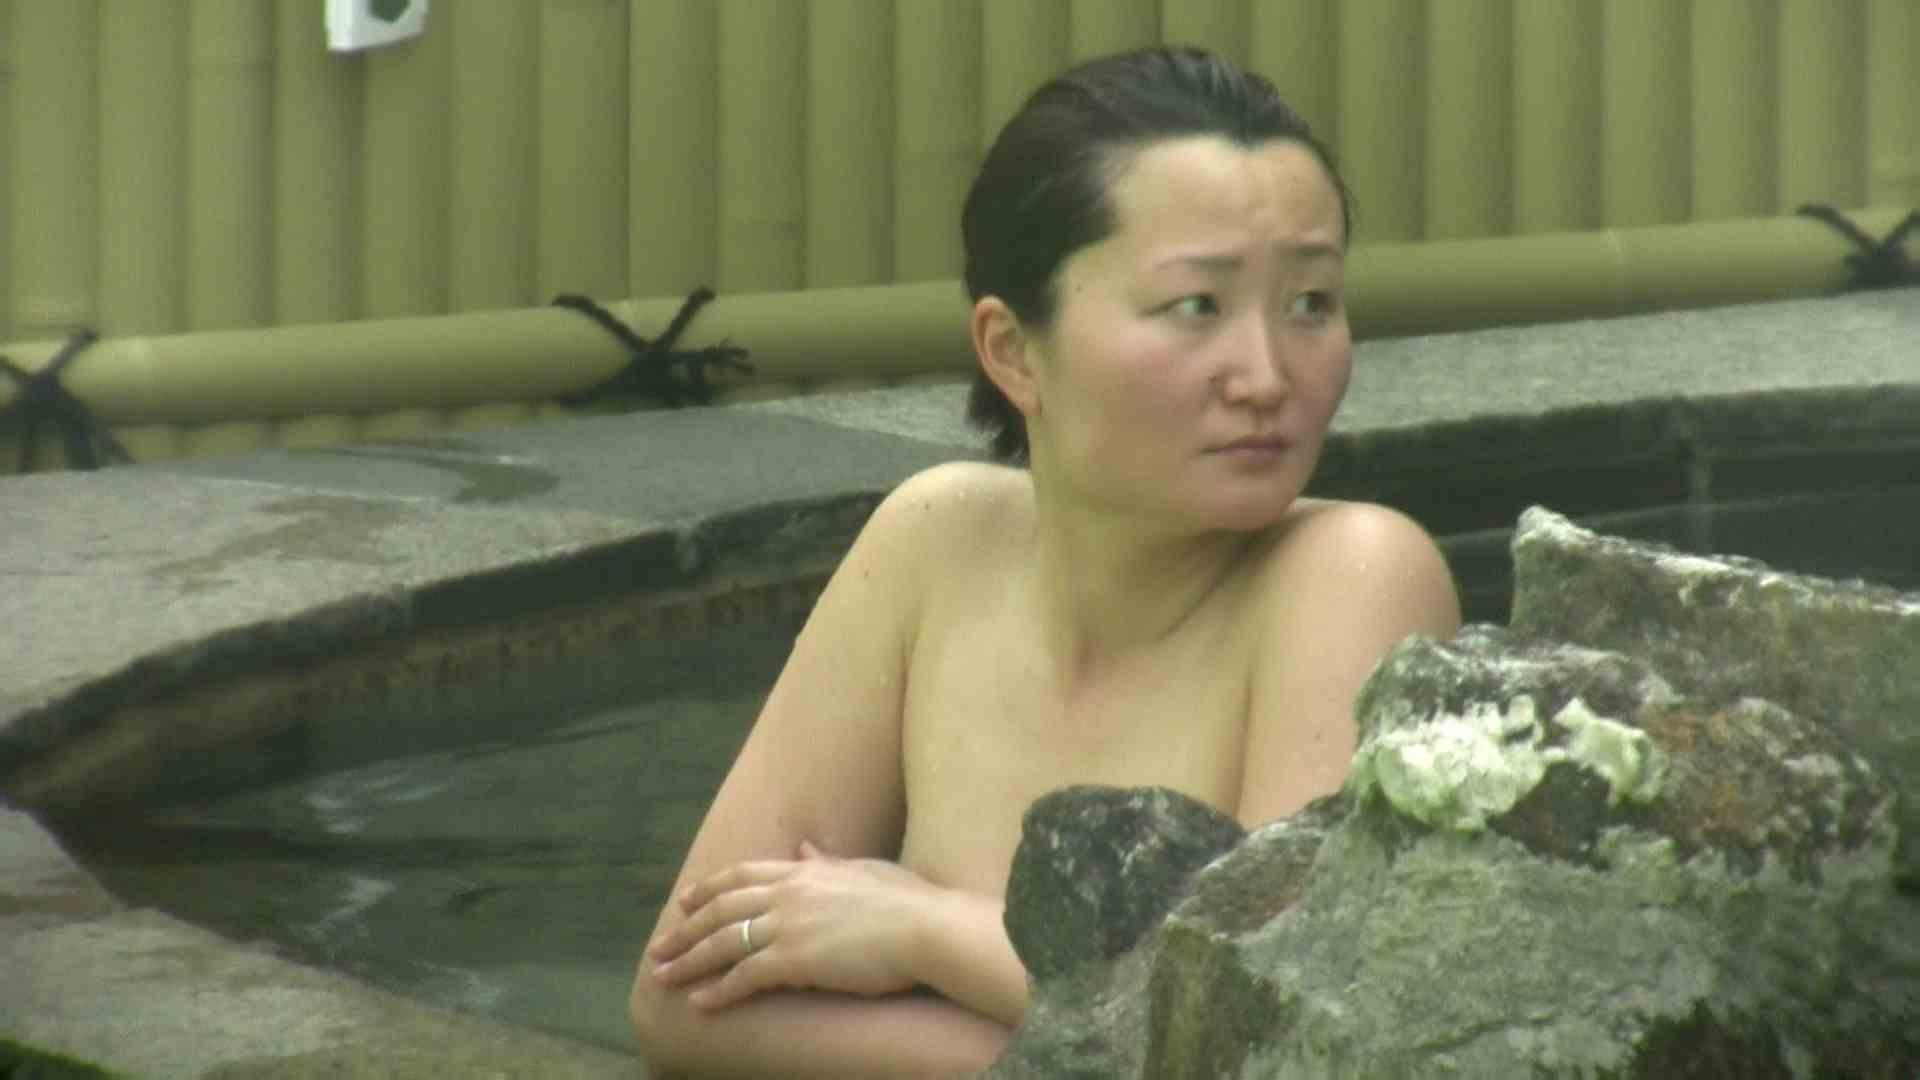 Aquaな露天風呂Vol.632 盗撮 | OLセックス  70画像 55